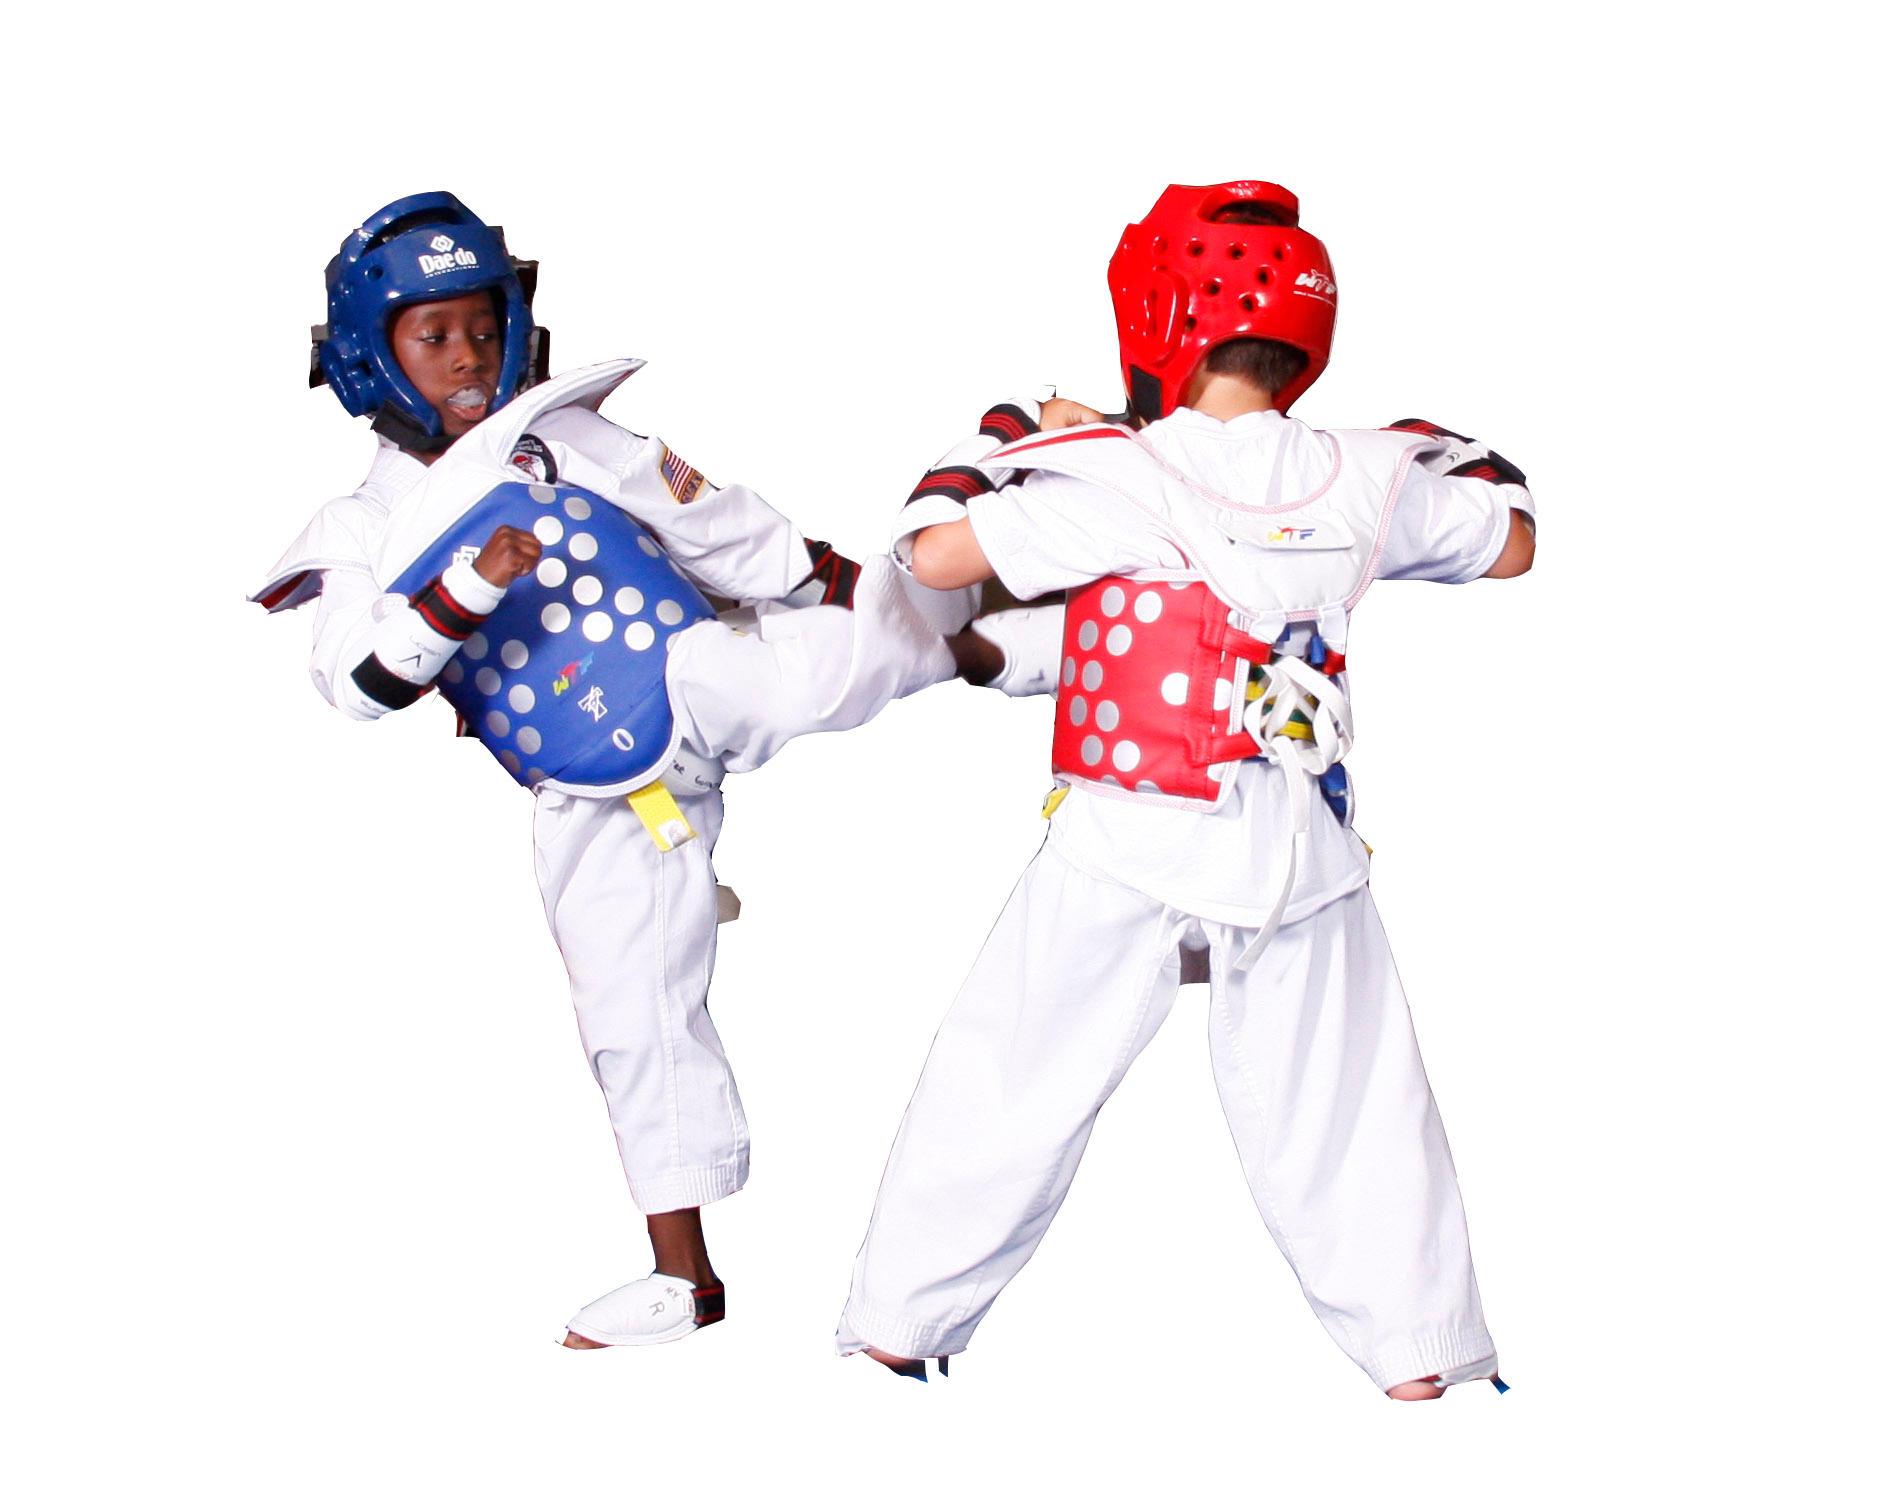 Millennium Martial Arts - Tae Kwon Do image 4